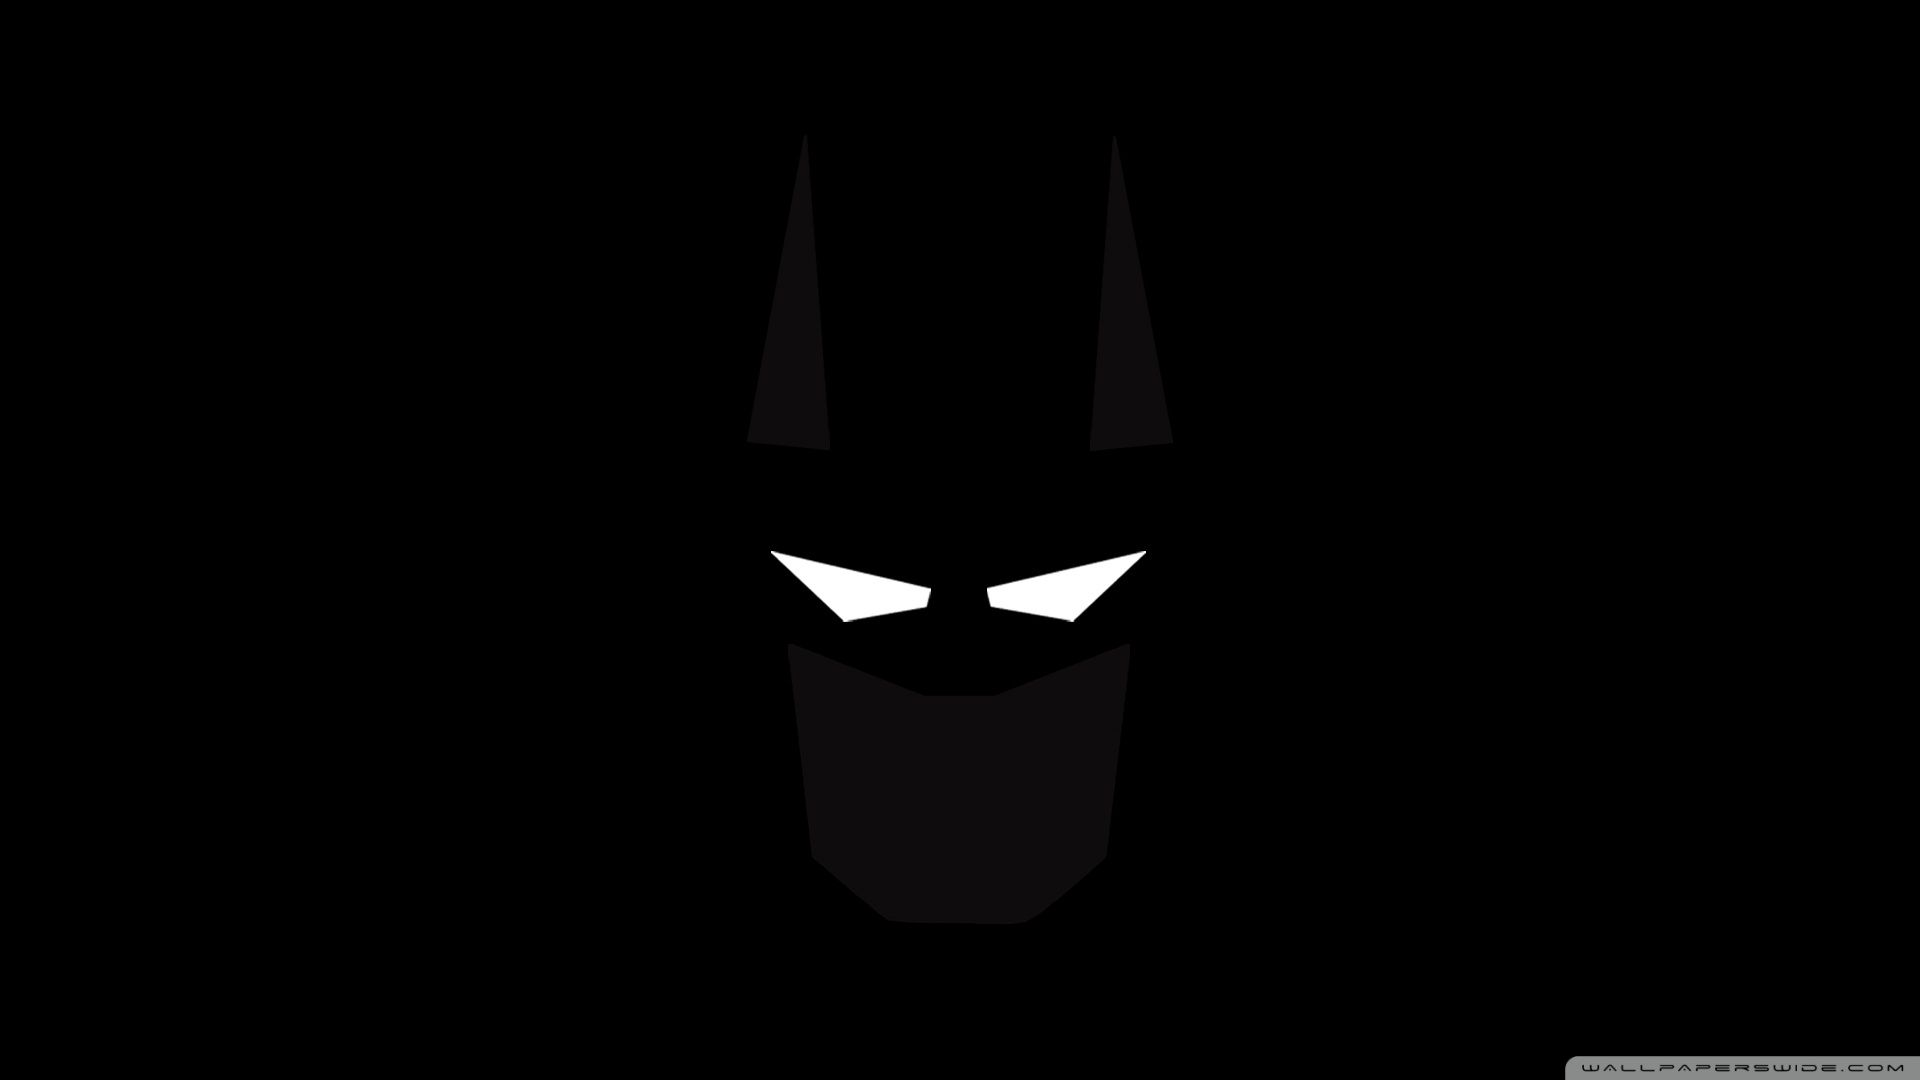 Batman Background Wallpaper For Tablet